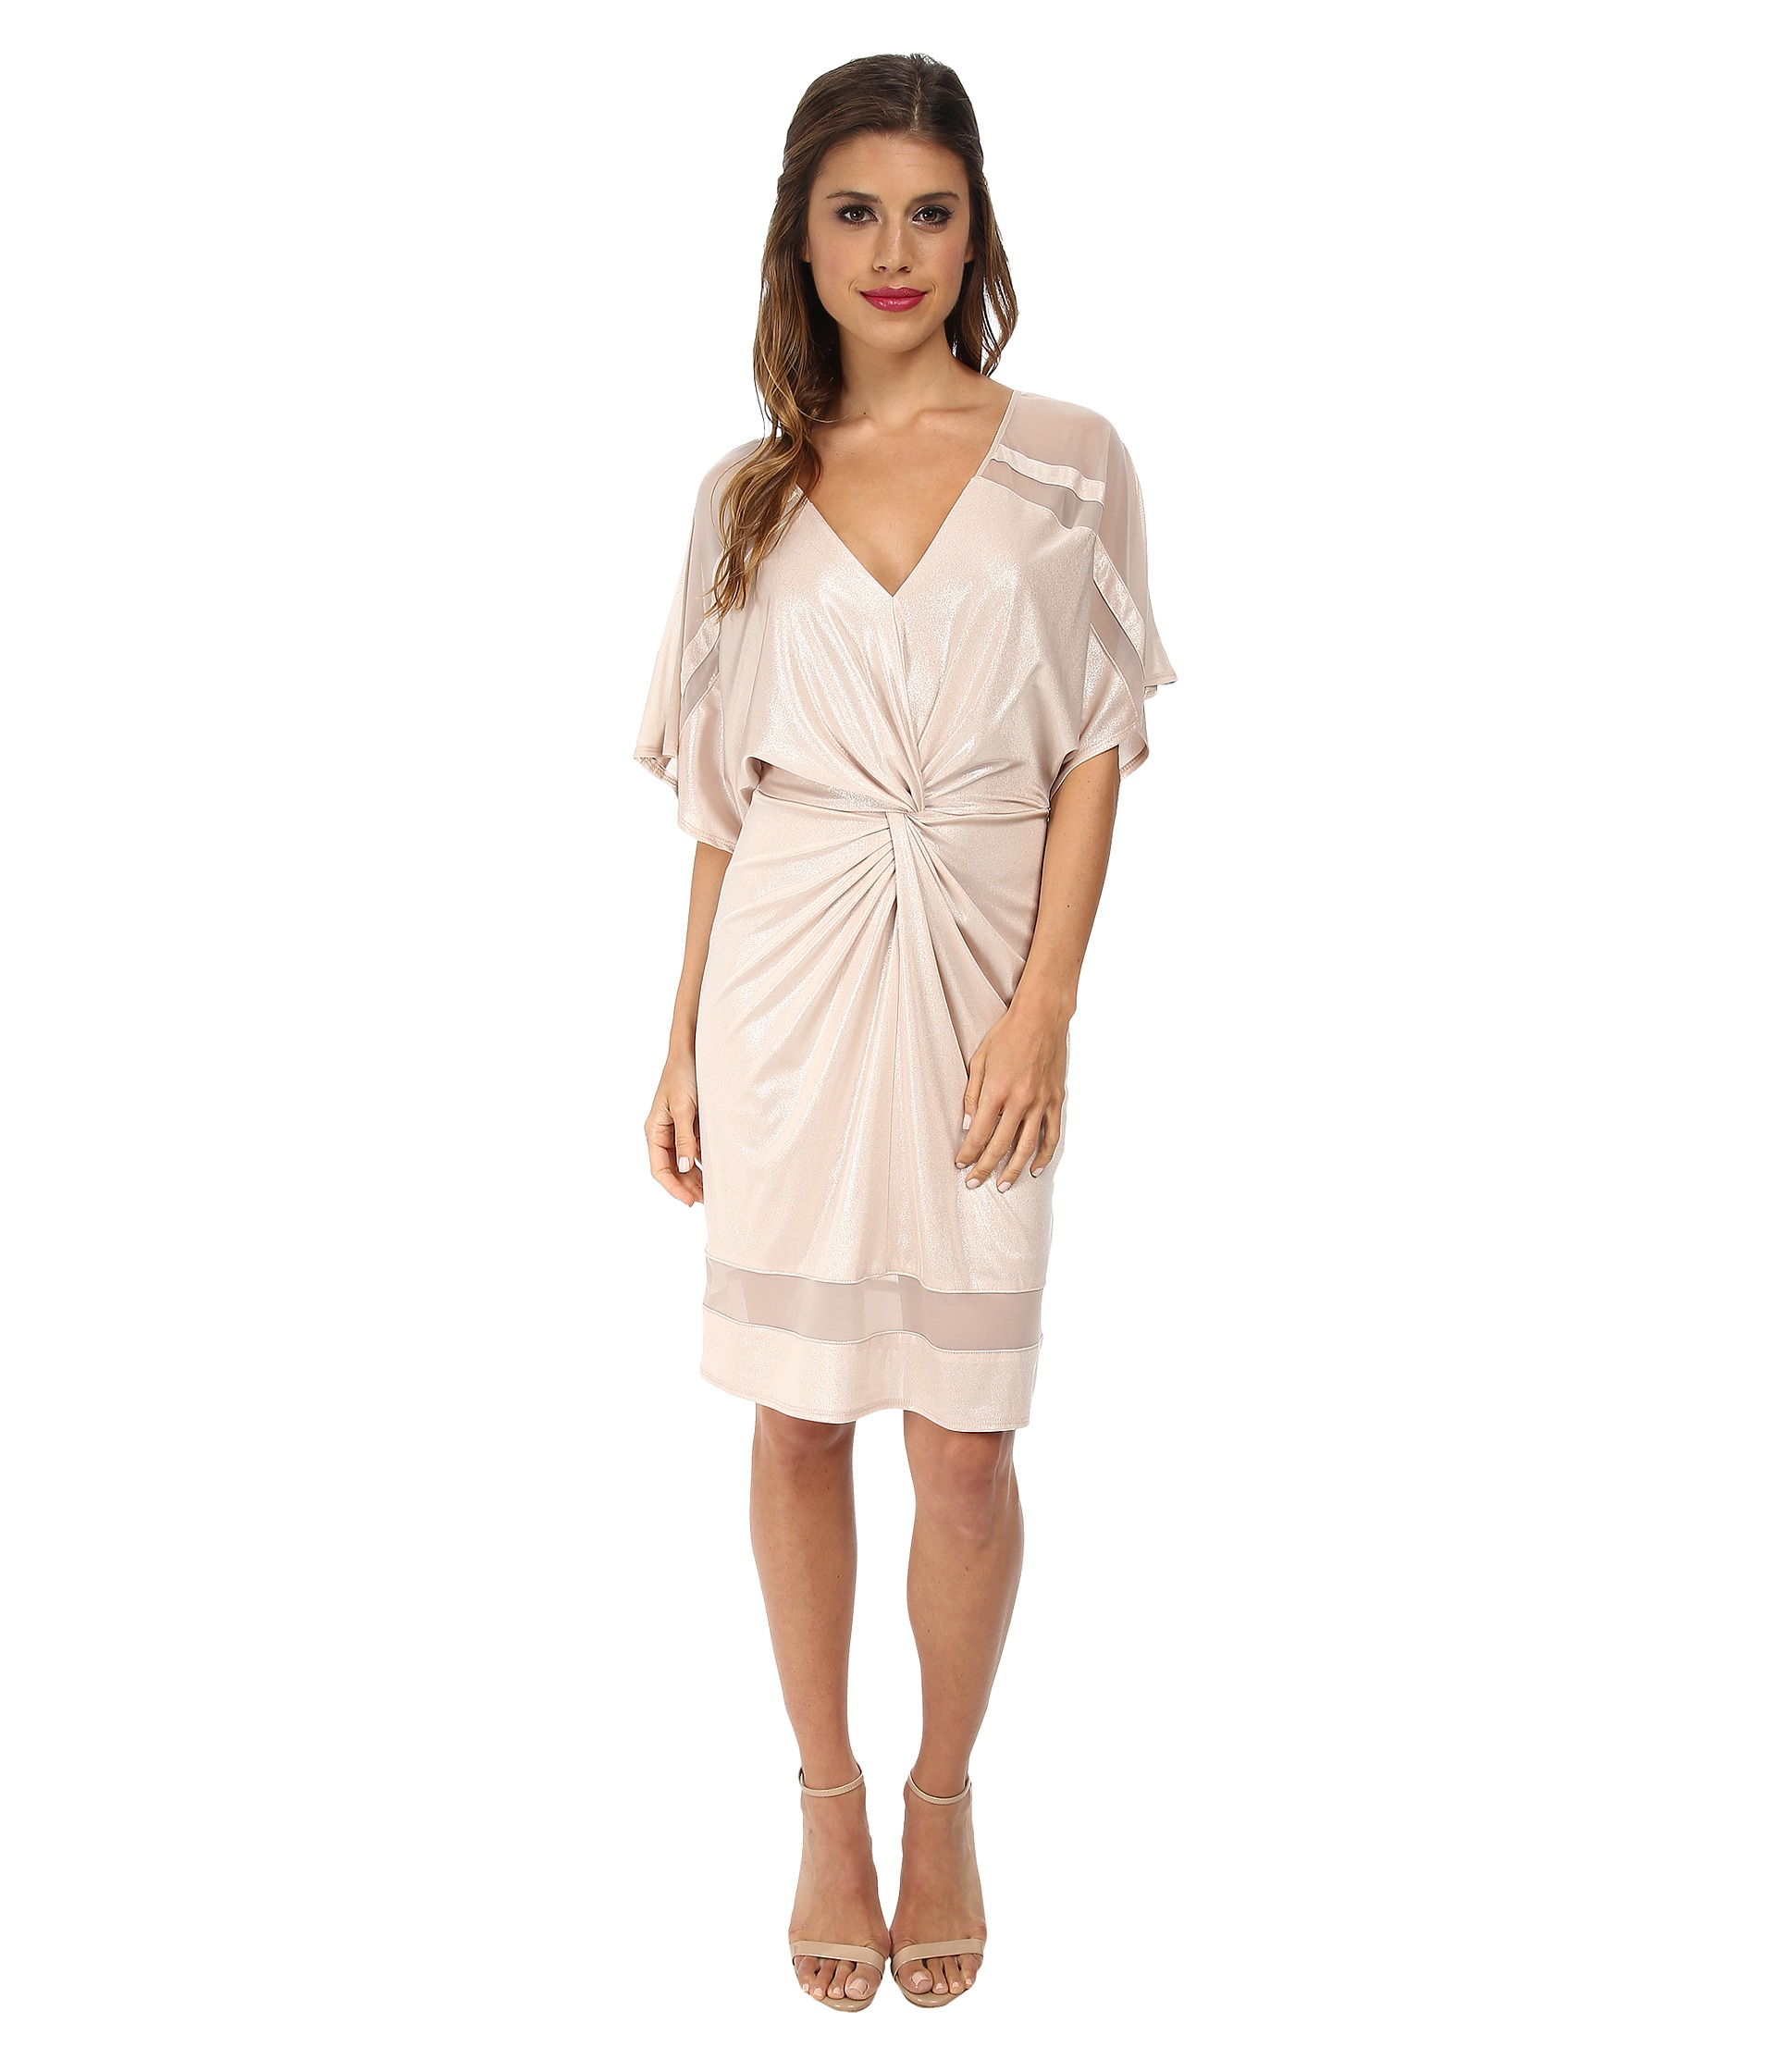 ABS Allen Schwartz Dresses Women at 6pm.com